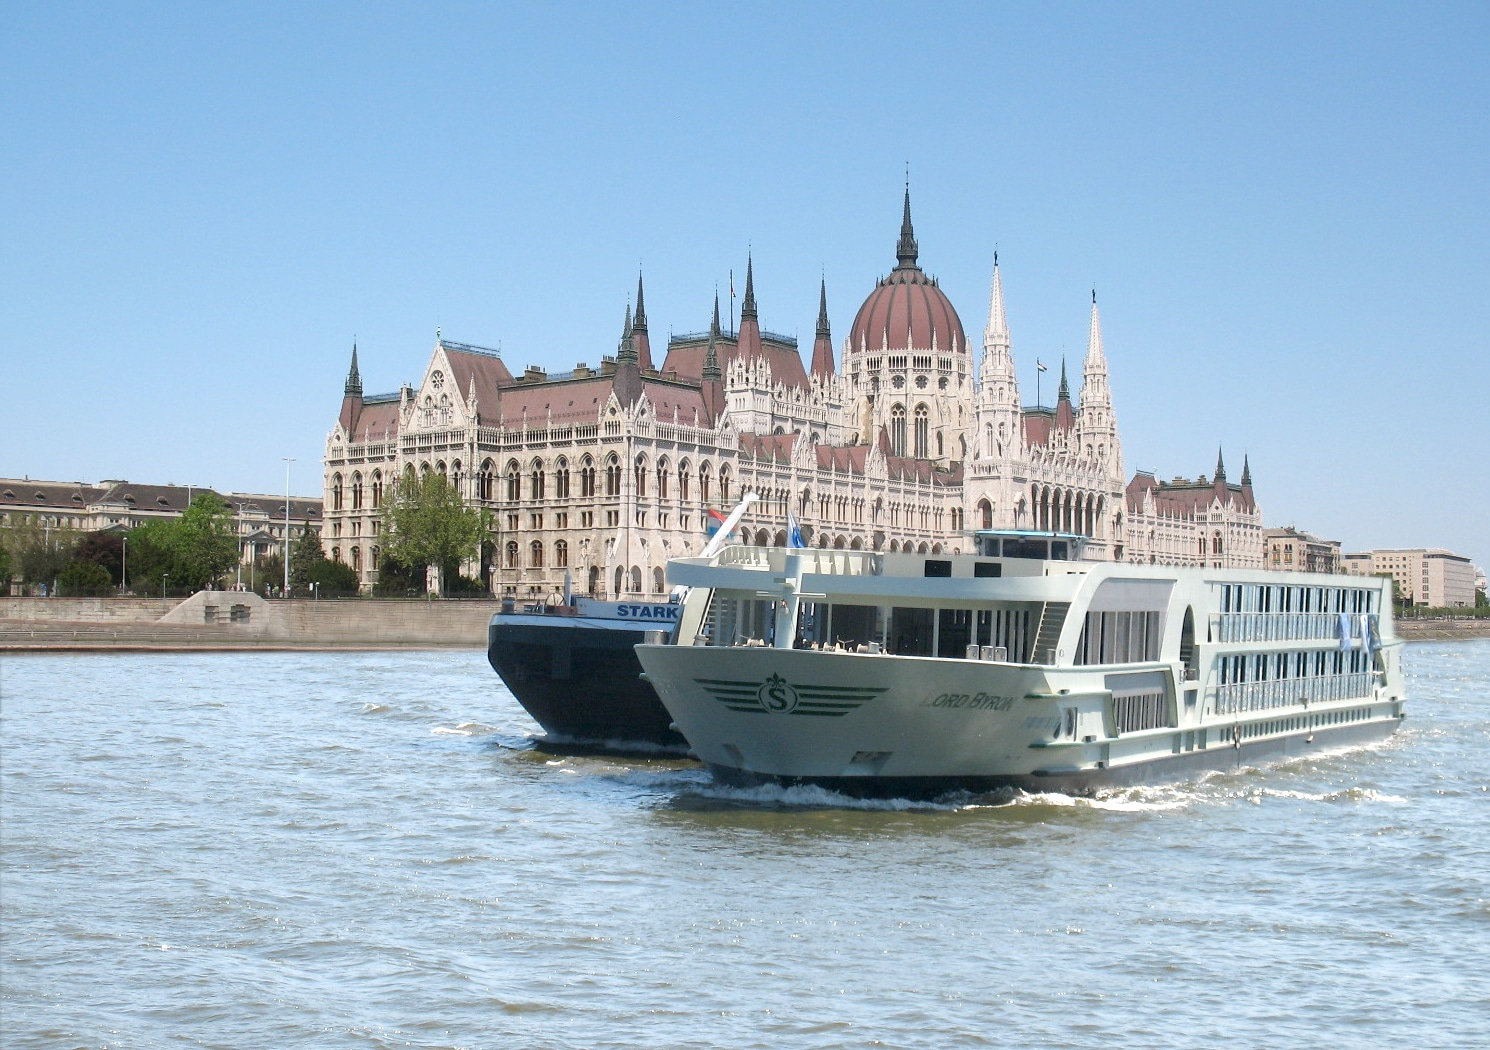 Viva-Cruises-Lord-Byron-Rivierschip-Riviercruise-2